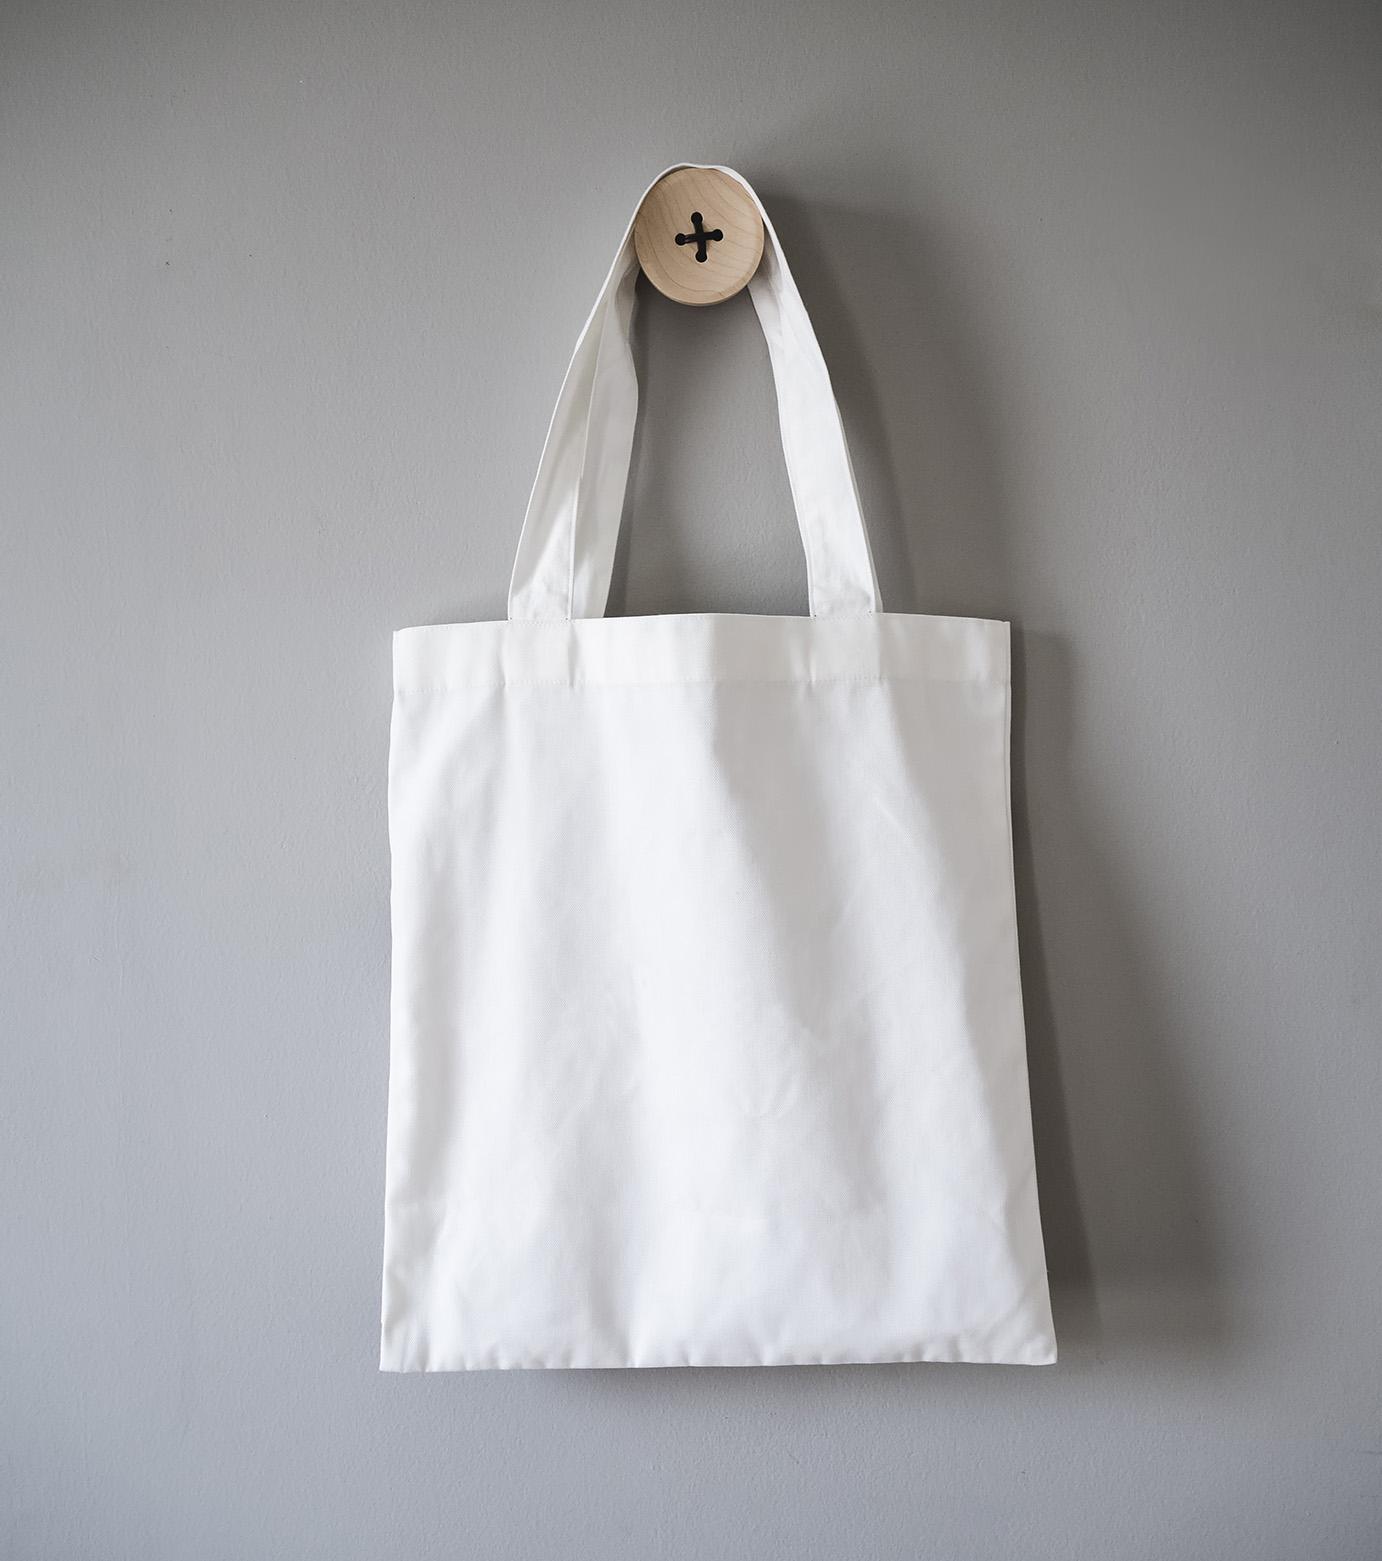 3d4a1307f3 Build a Bag – Απλή Tσάντα σε μια Hμέρα - Milos Crafts